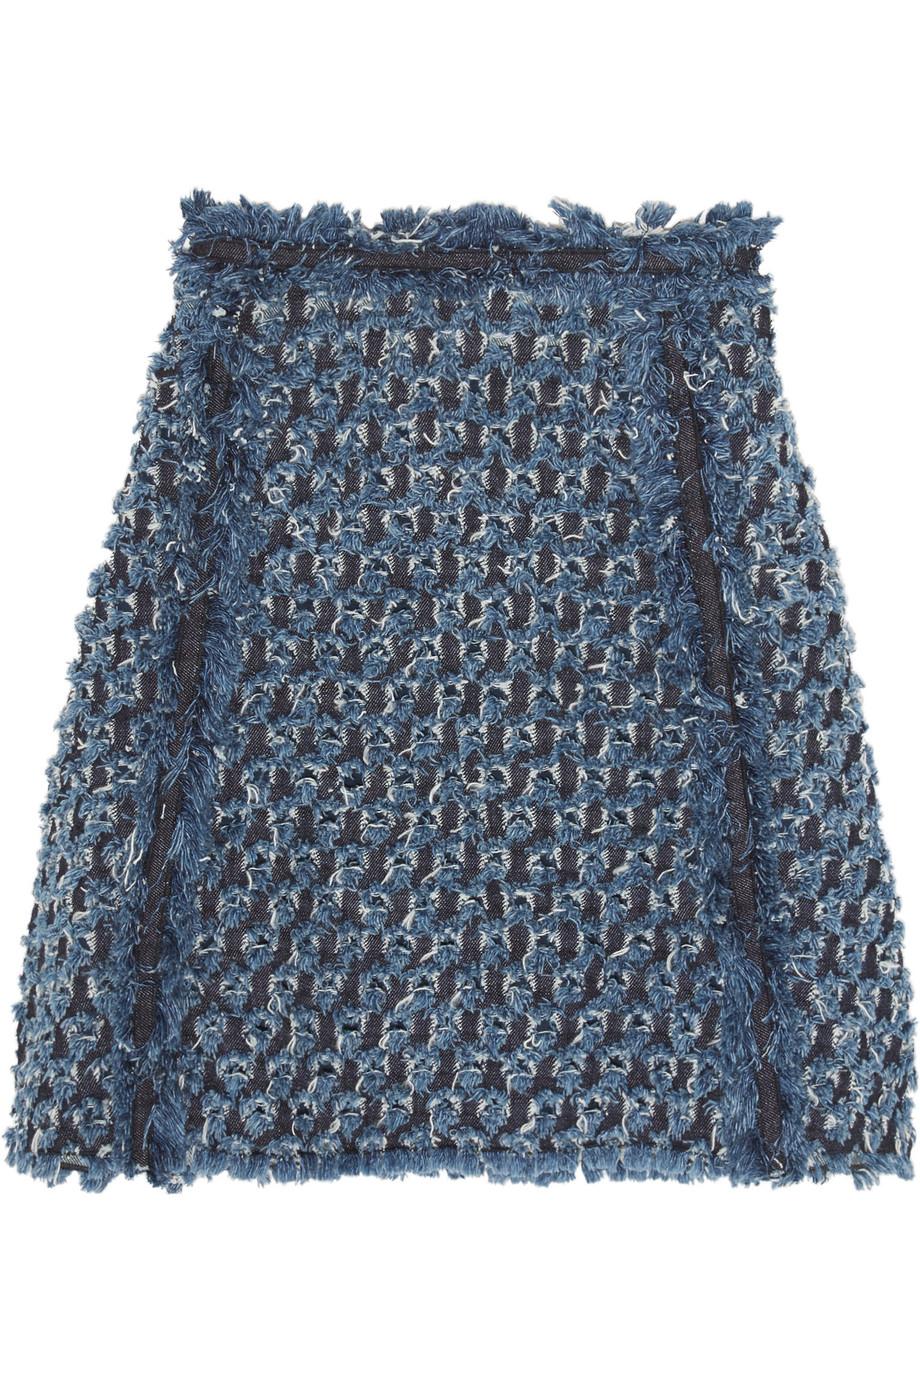 Sonia Rykiel Frayed Laser-Cut Denim Mini Skirt, Blue, Women's, Size: 34